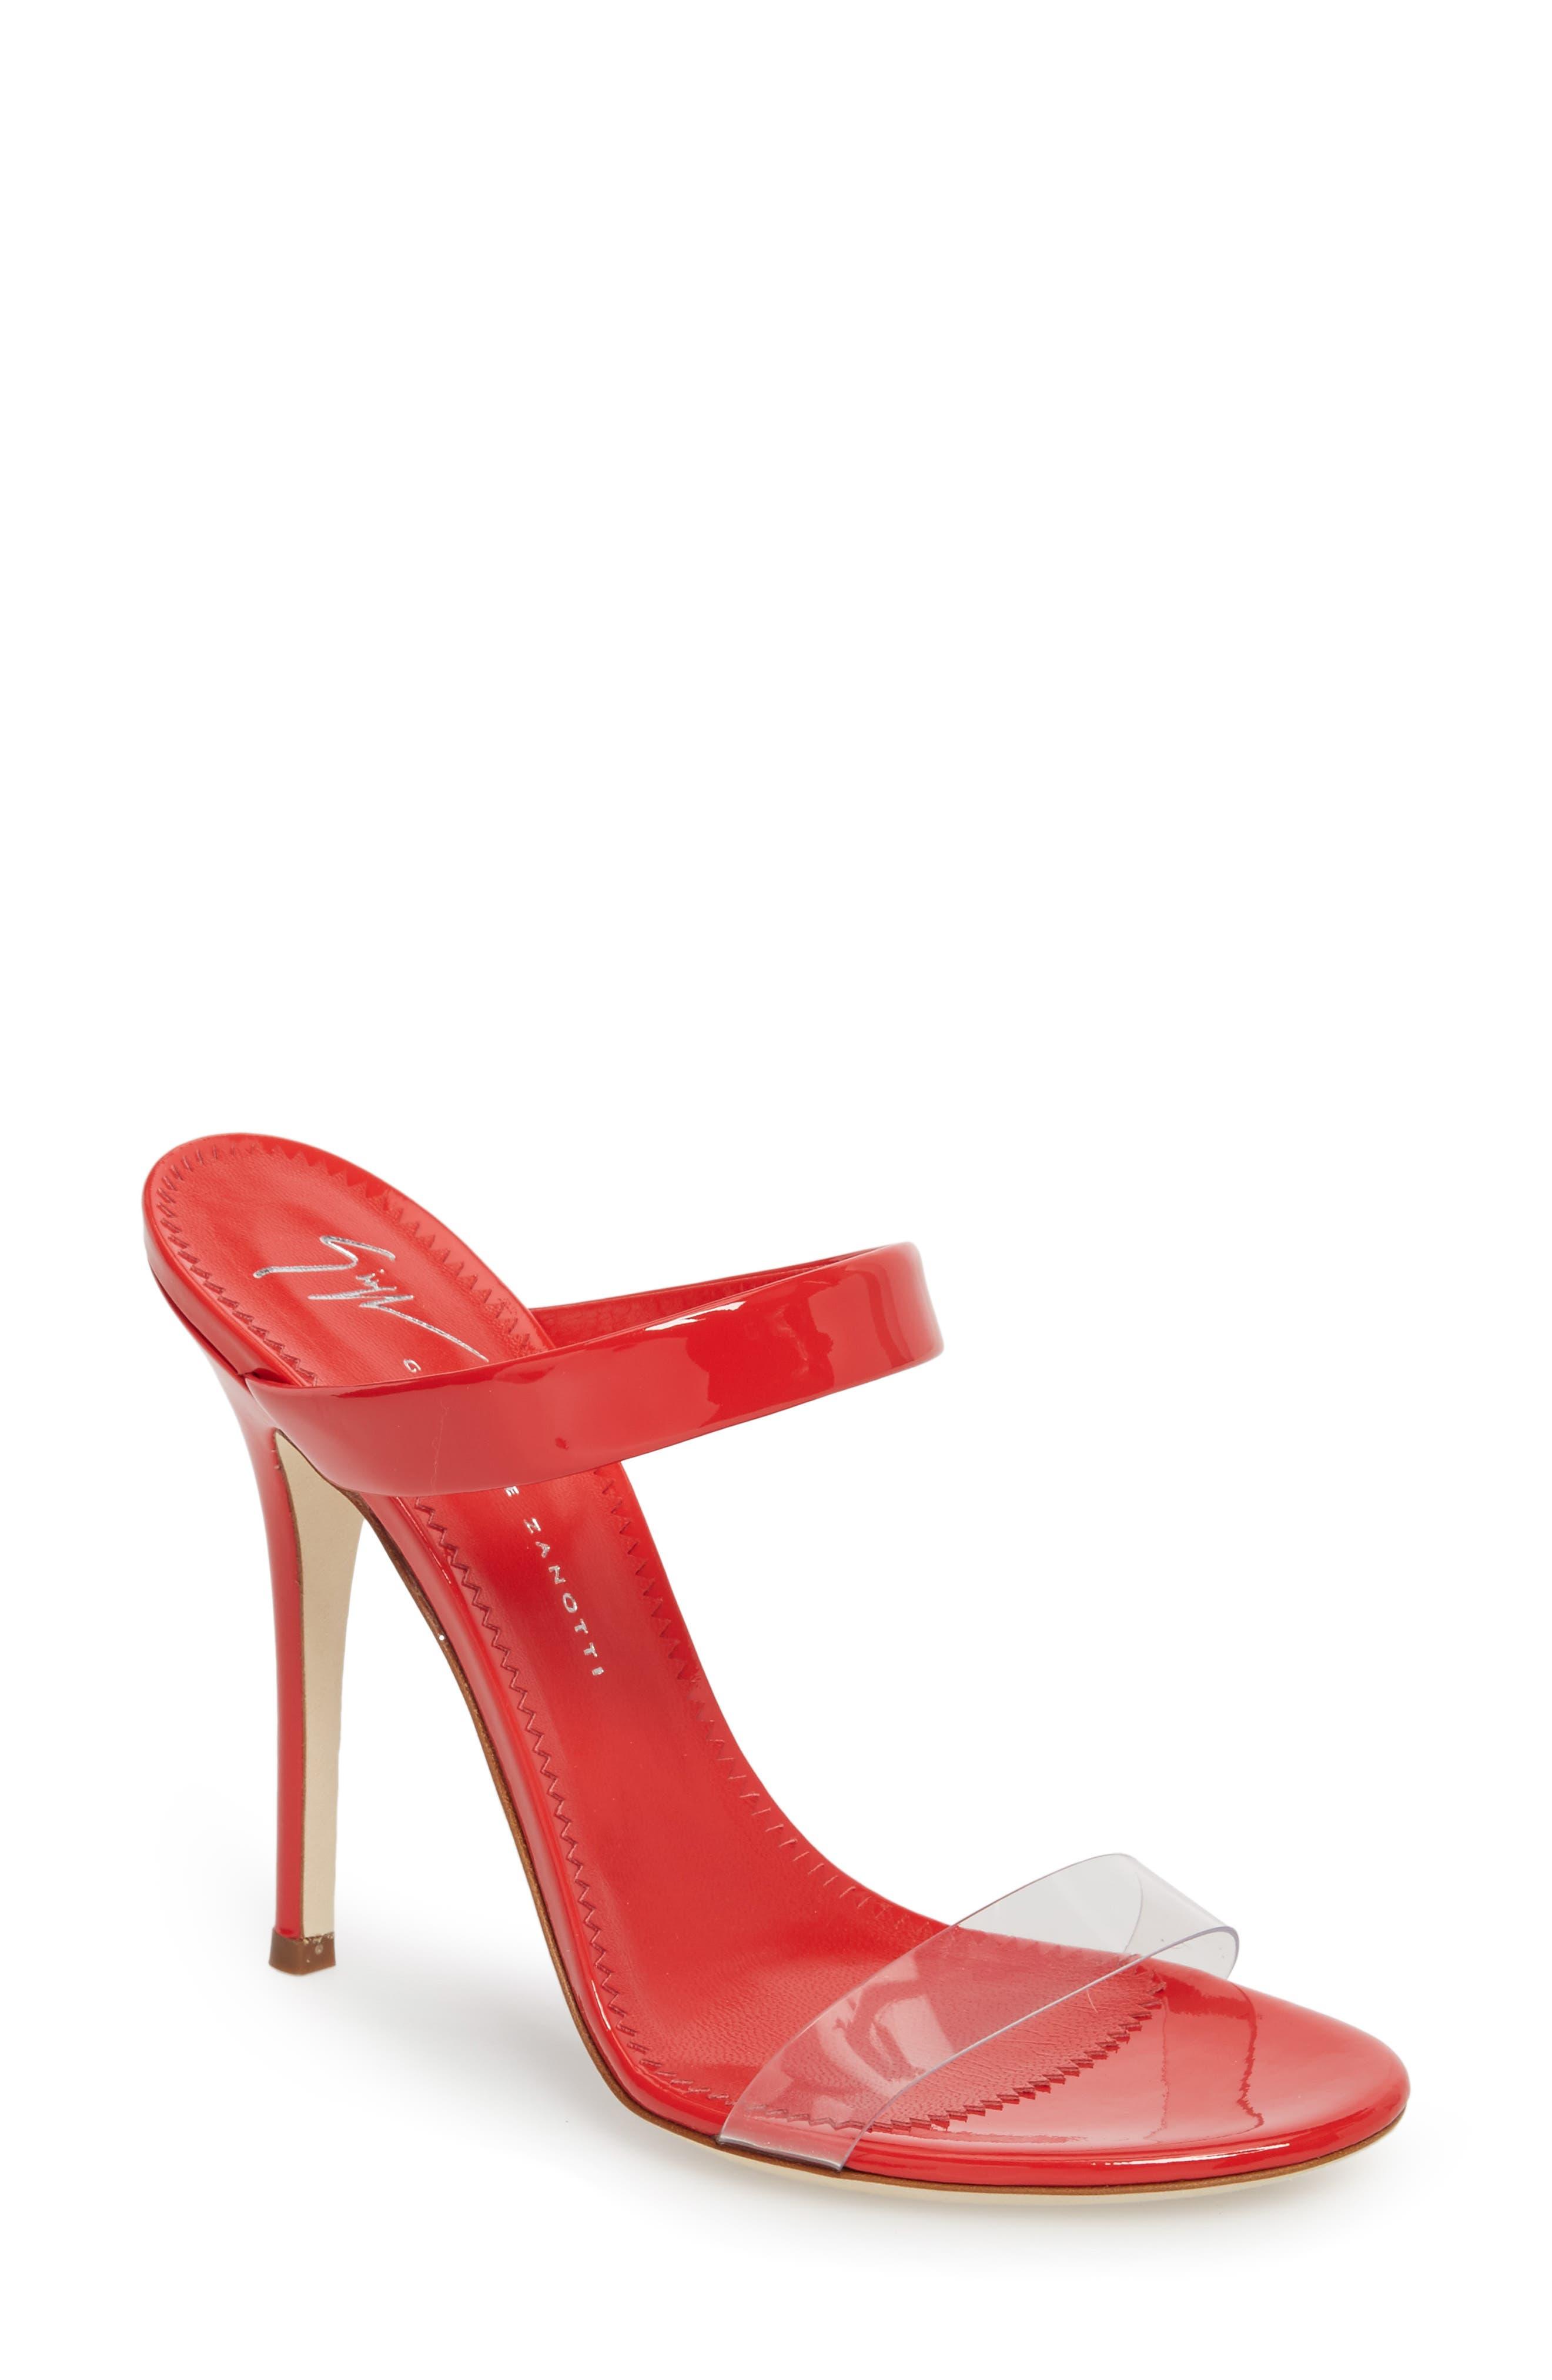 Alternate Image 1 Selected - Giuseppe Zanotti Strappy Sandal (Women)